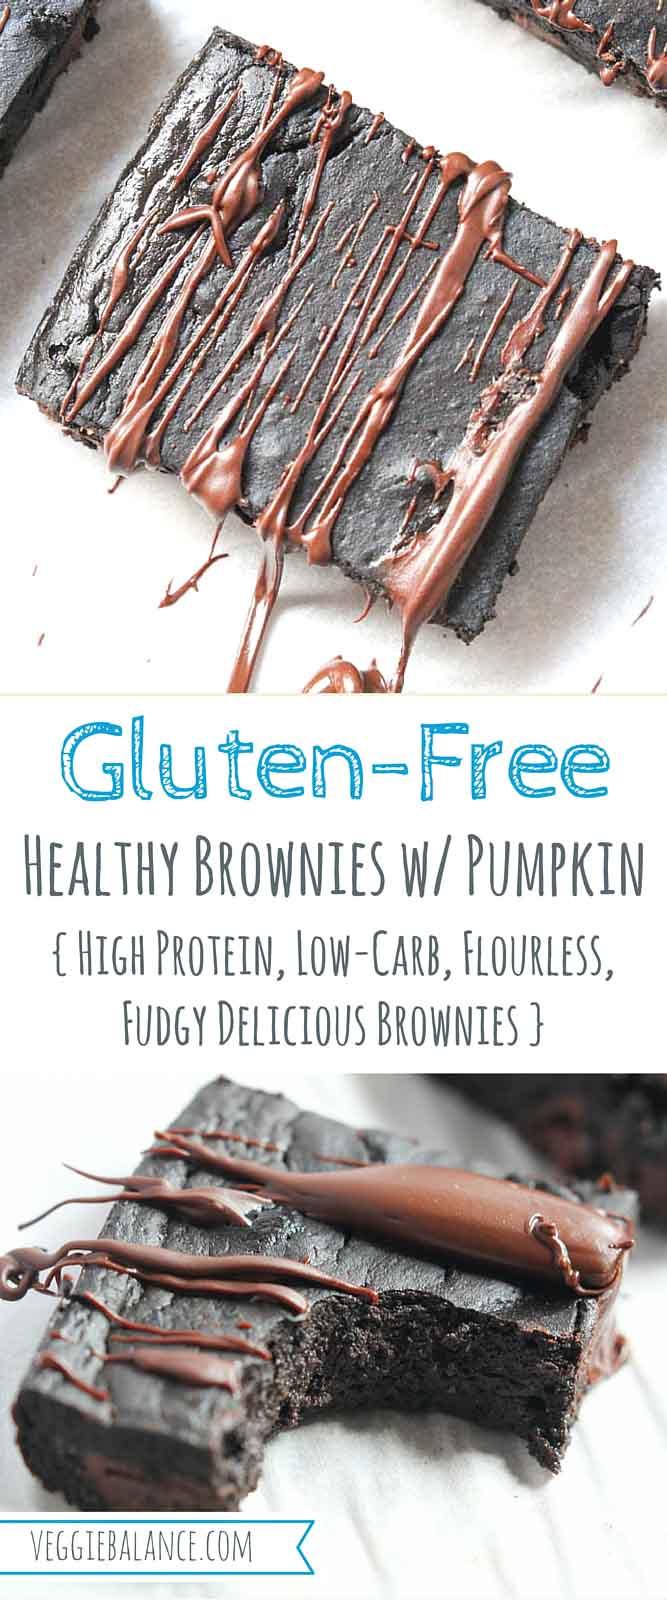 Healthy Brownies with Pumpkin - Veggiebalance.com